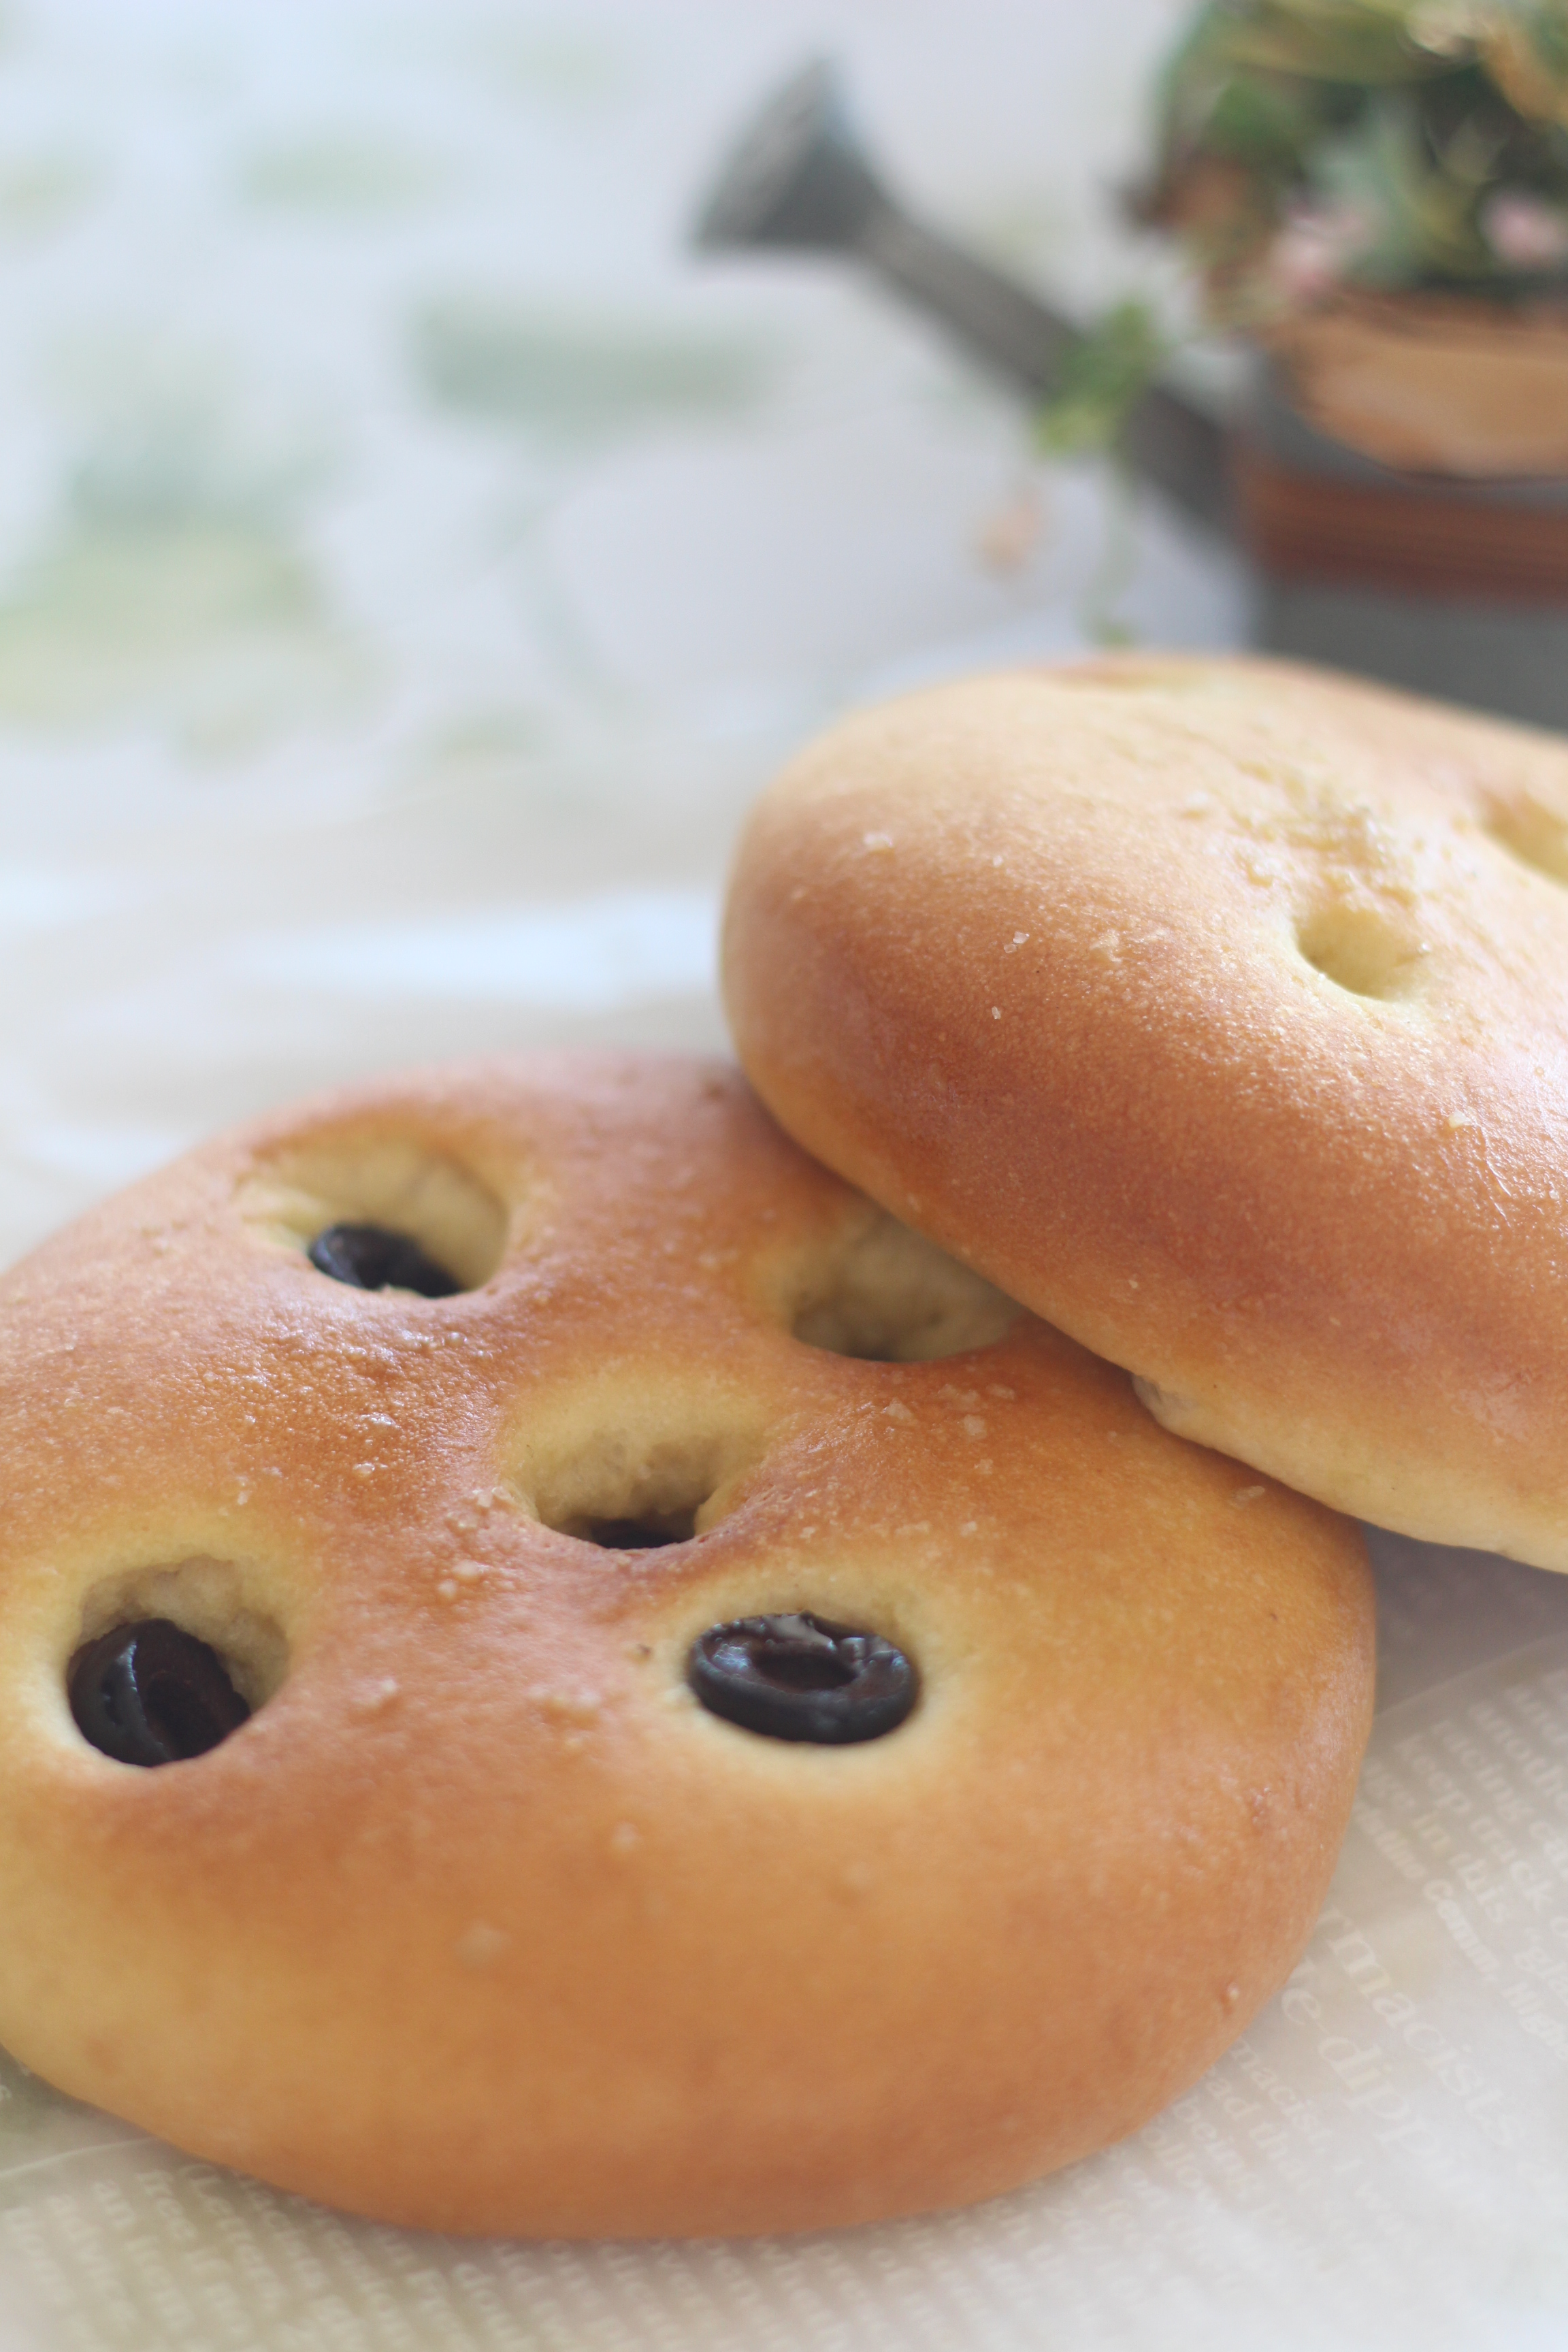 a-ta-sante 糖質制限パン料理教室。京都江部粉糖質制限パンフォカッチャのデイ上がりです。